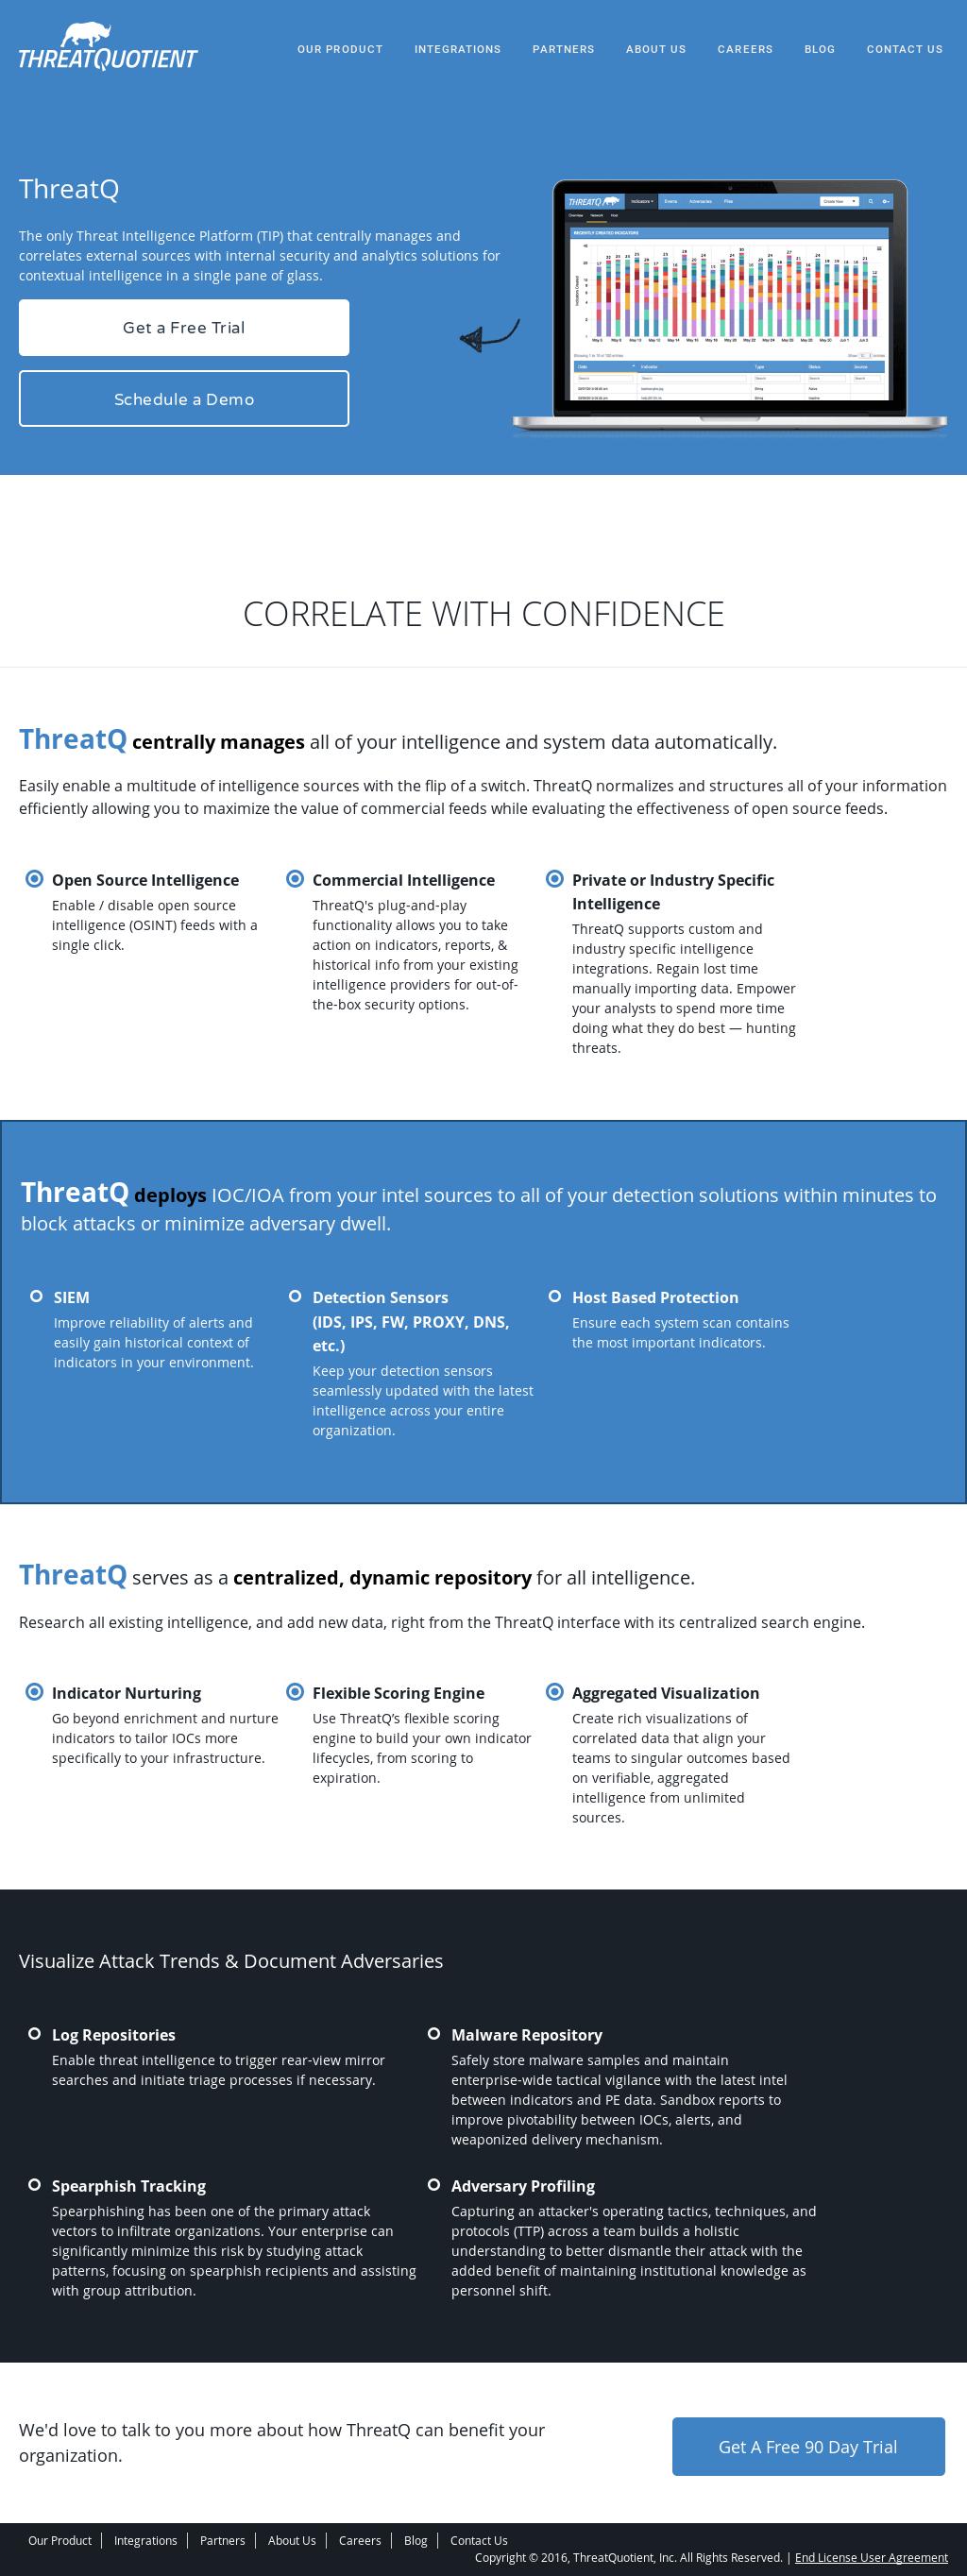 ThreatQuotient Competitors, Revenue and Employees - Owler